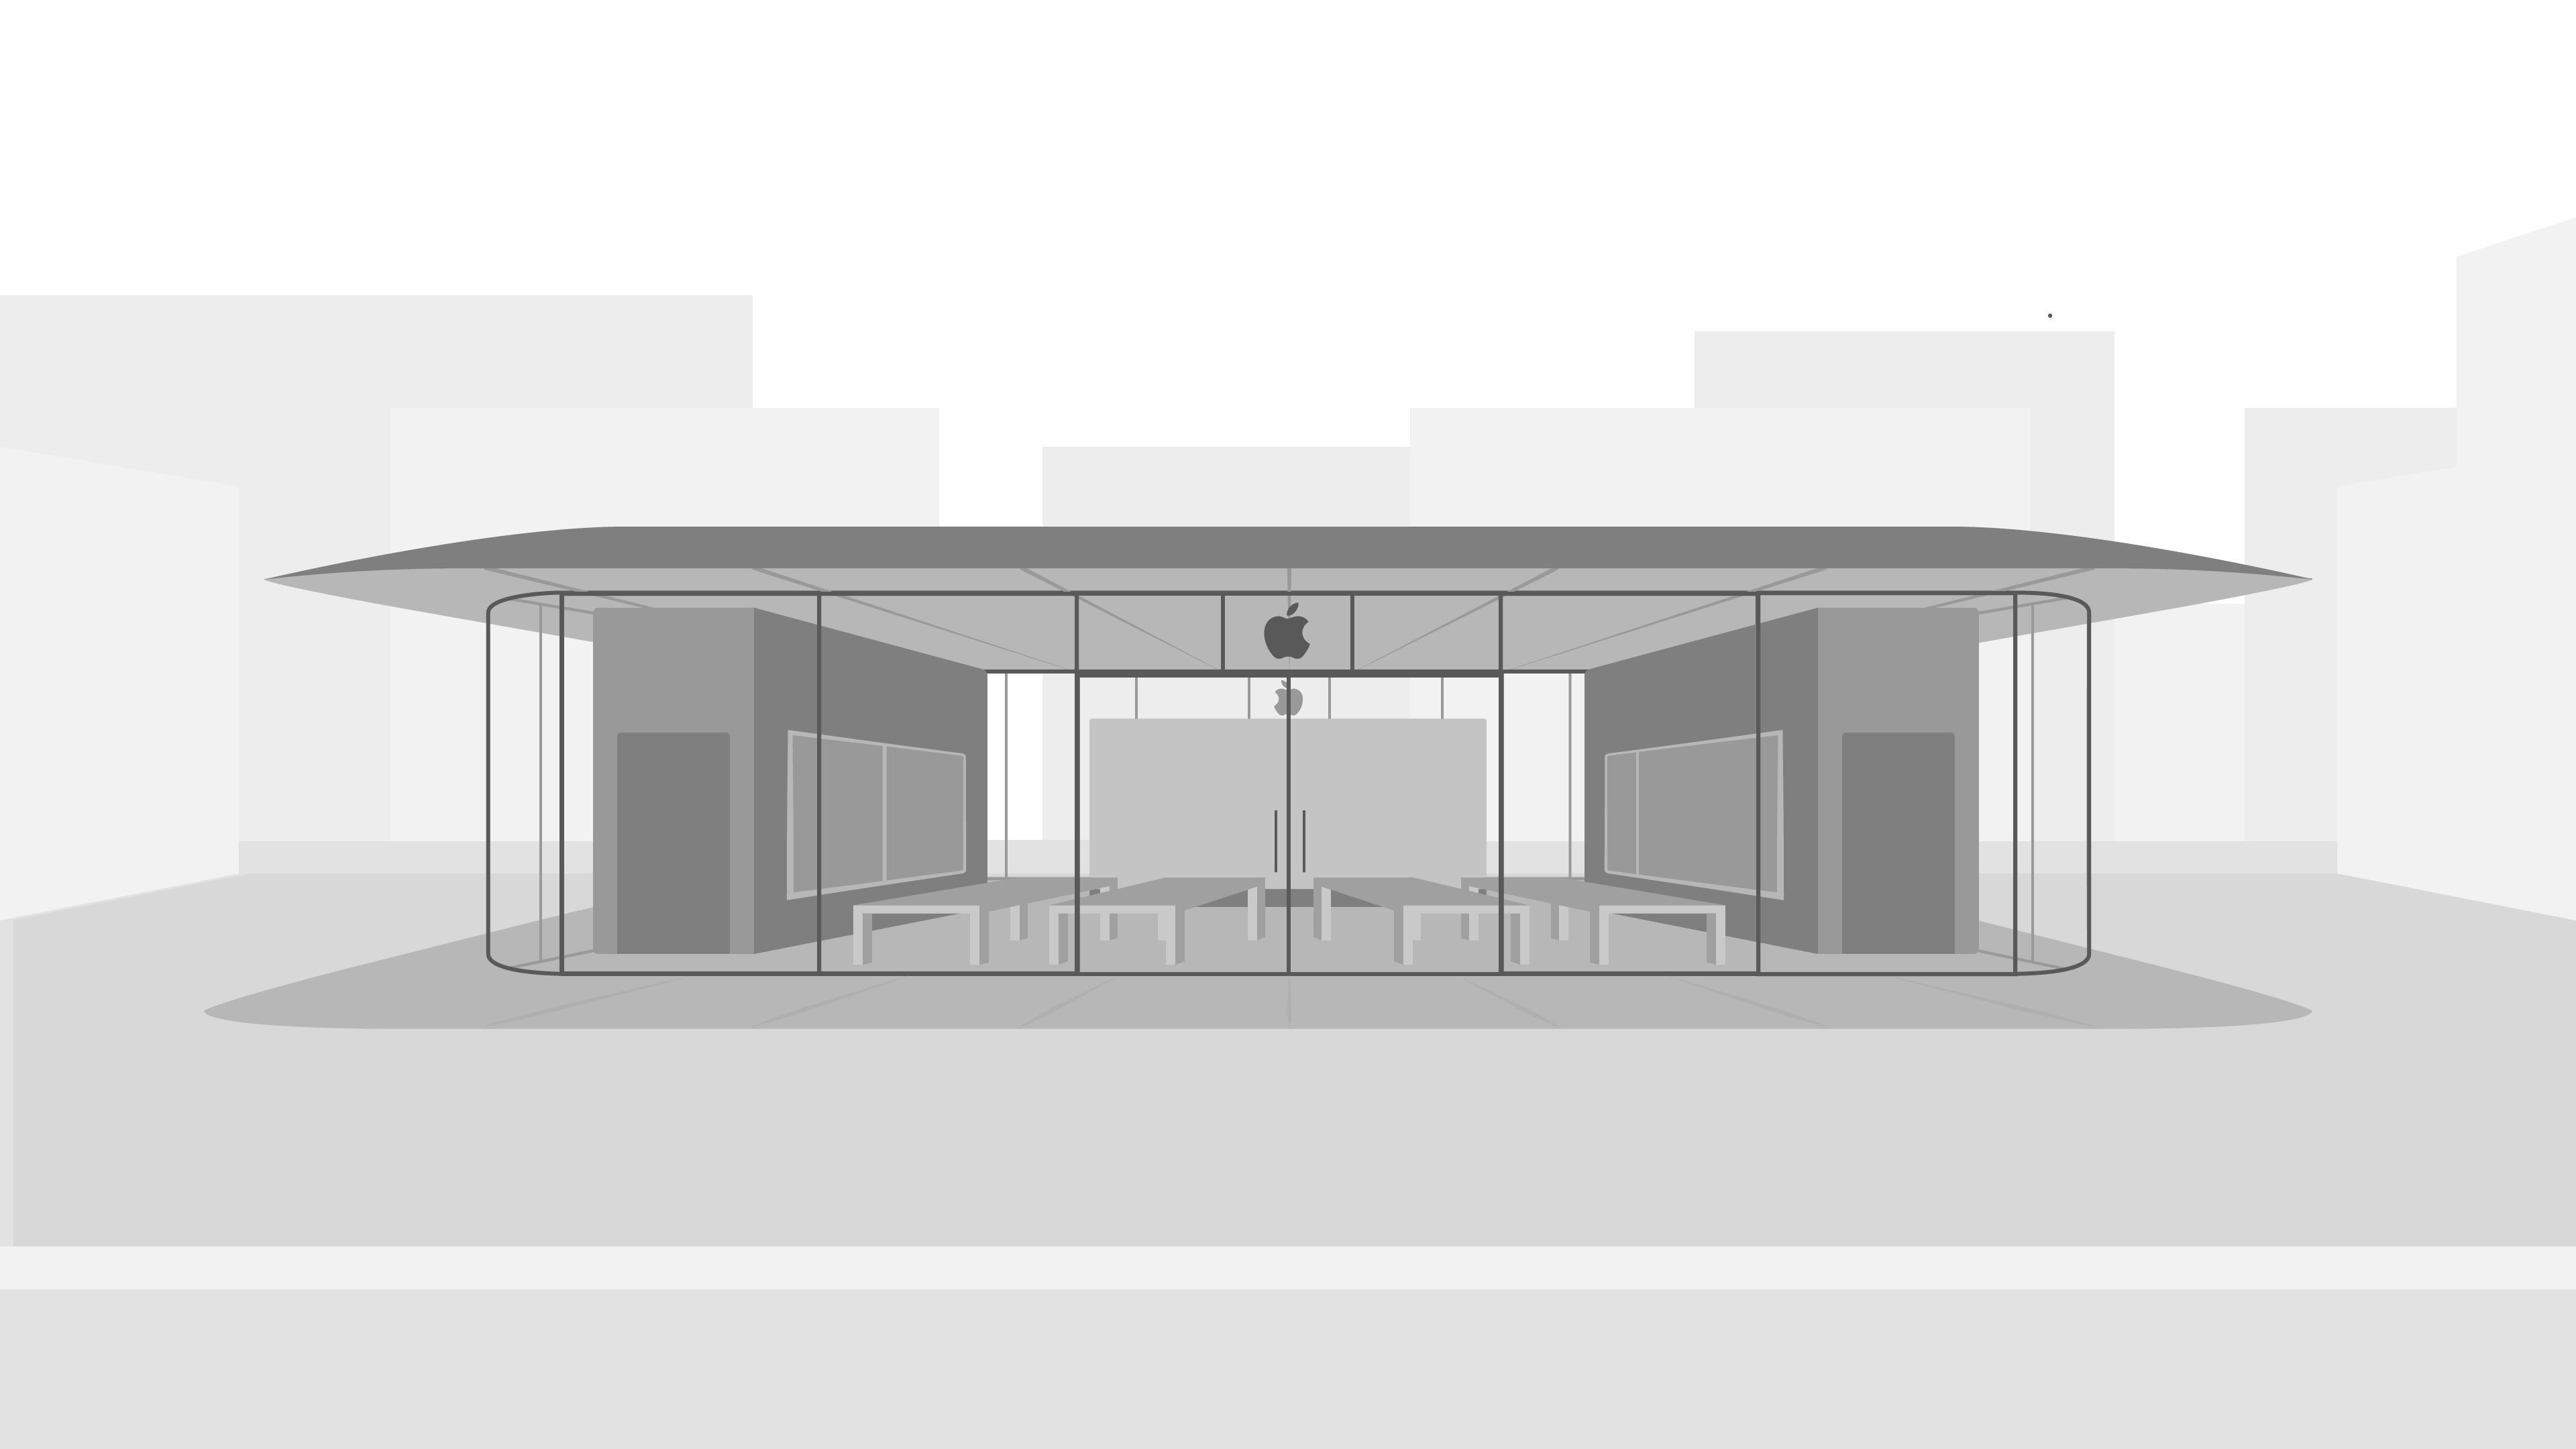 Apple's modern new store in Walnut Creek, CA set to open on July 28th